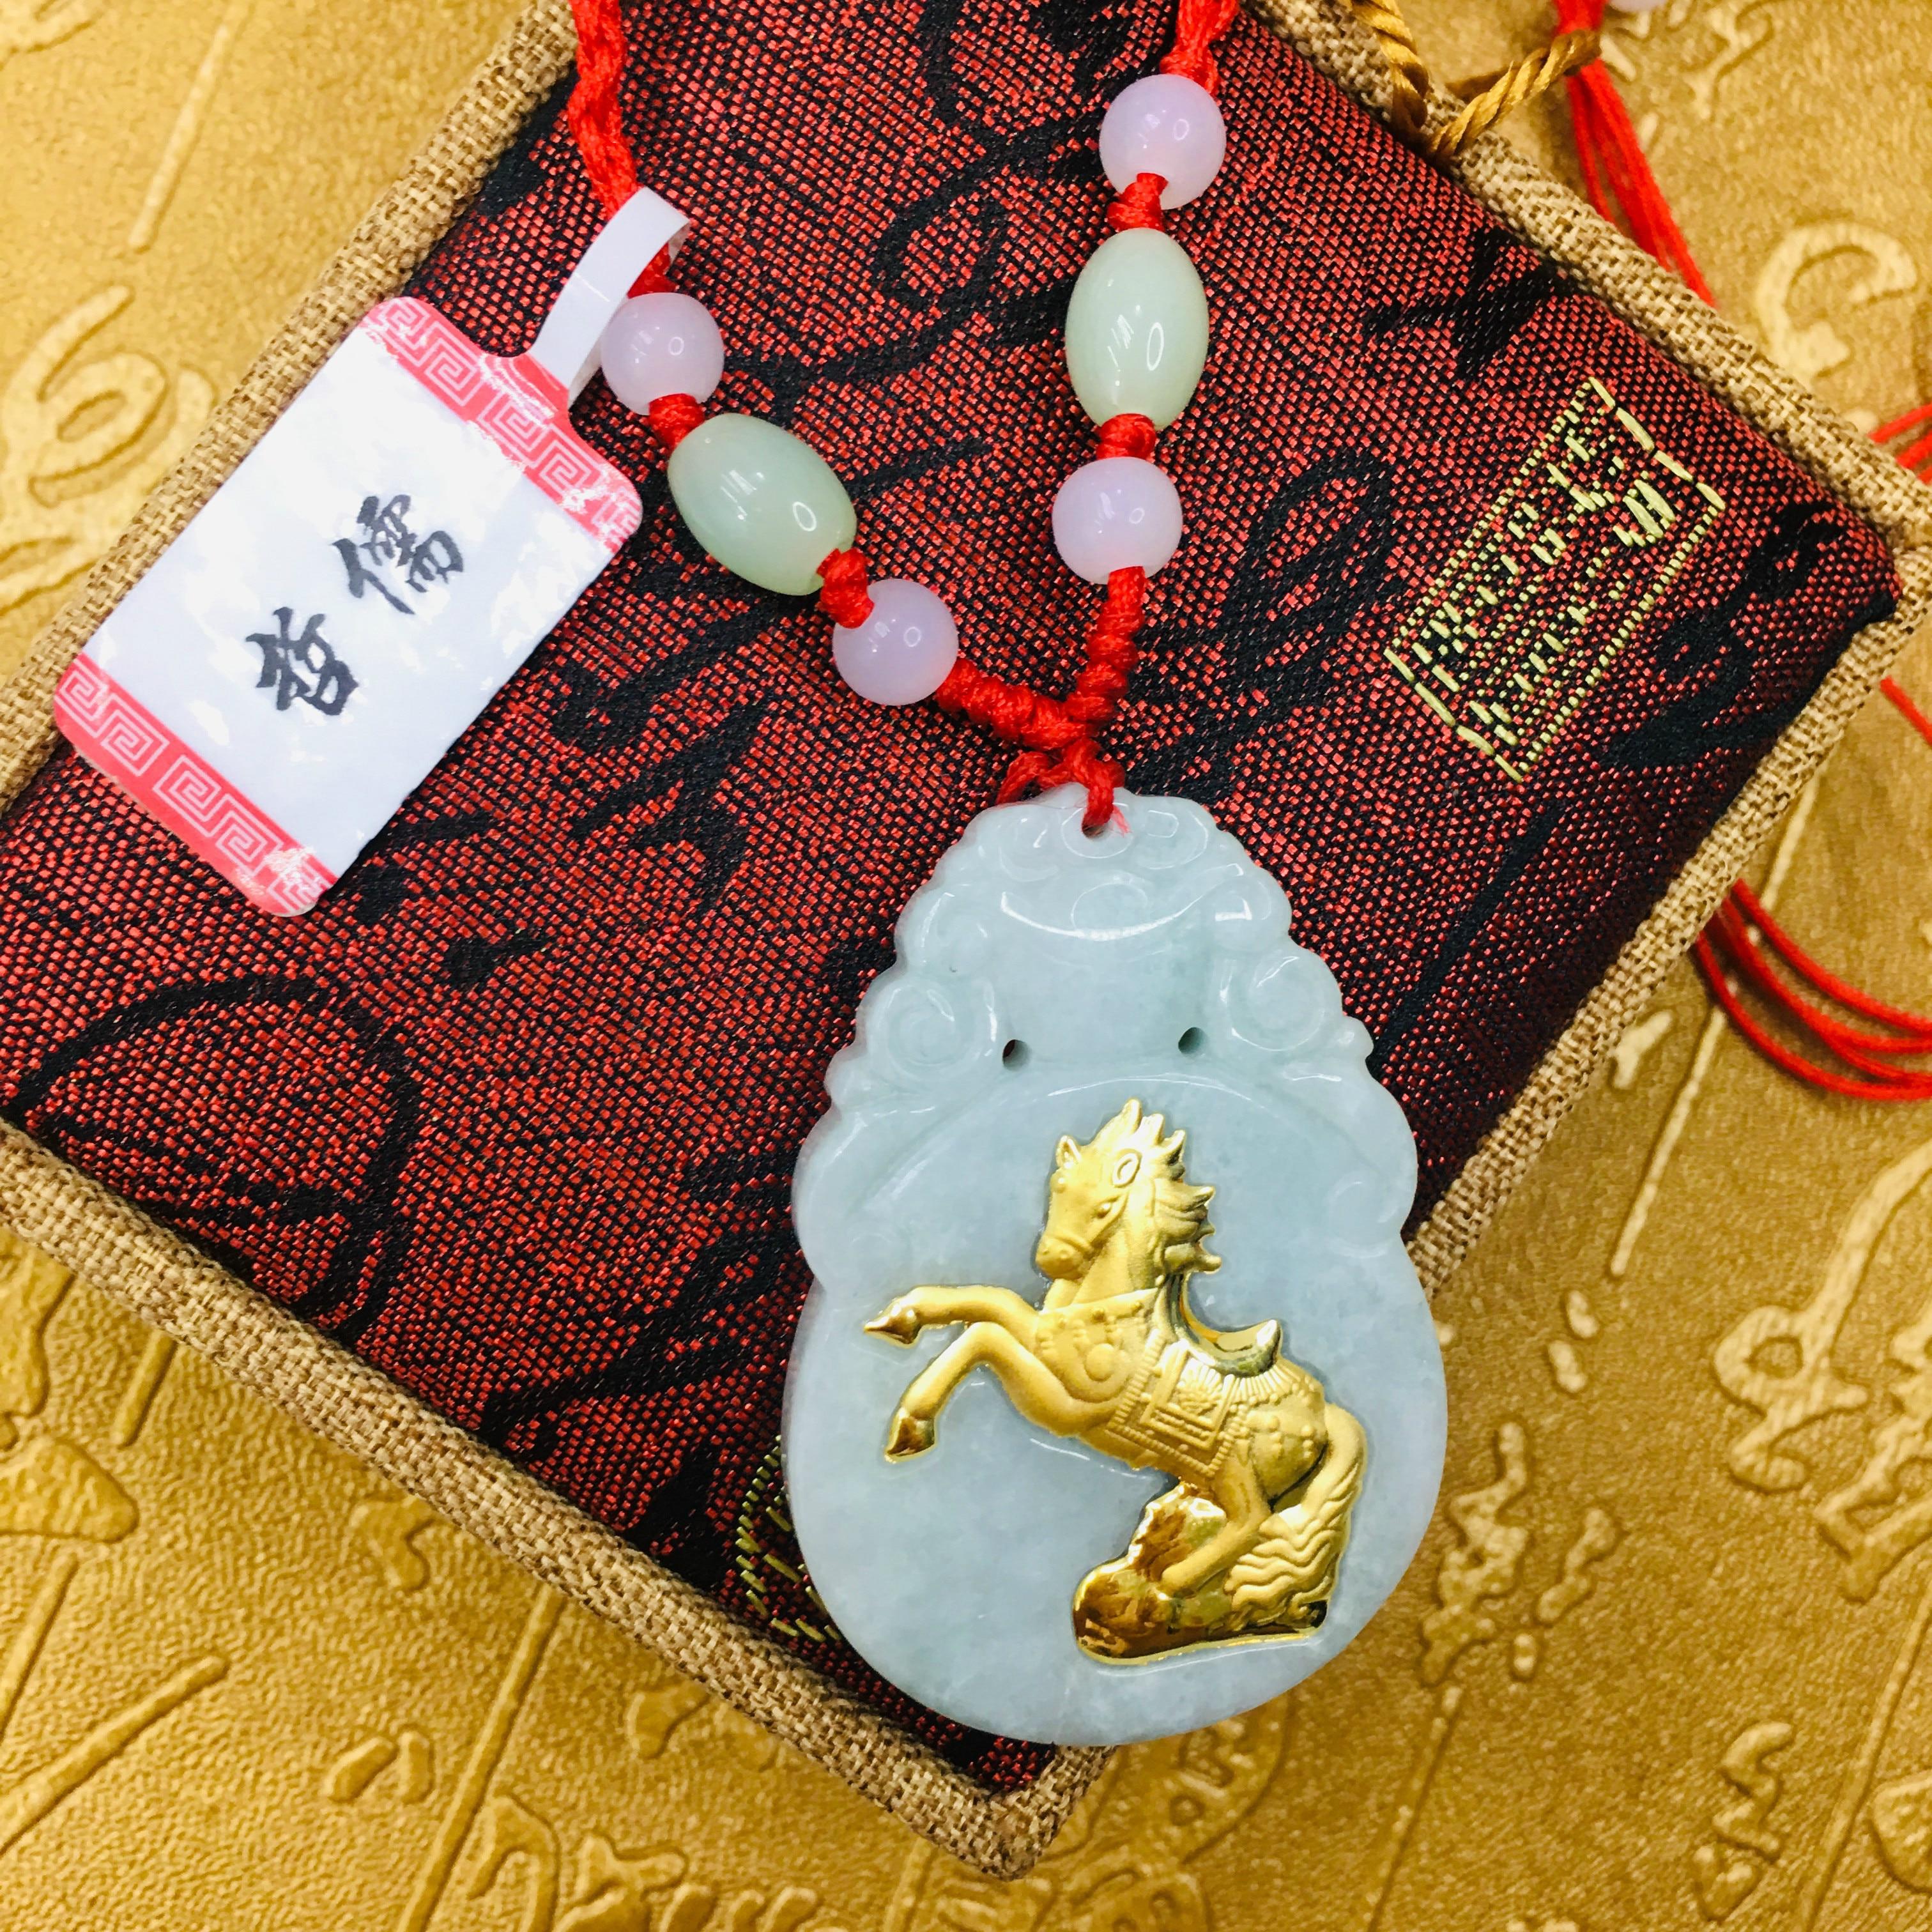 Enviar un certificado Natural de jade birmano incrustado 24K oro Zodiaco buena suerte caballo colgante con collar hecho A mano